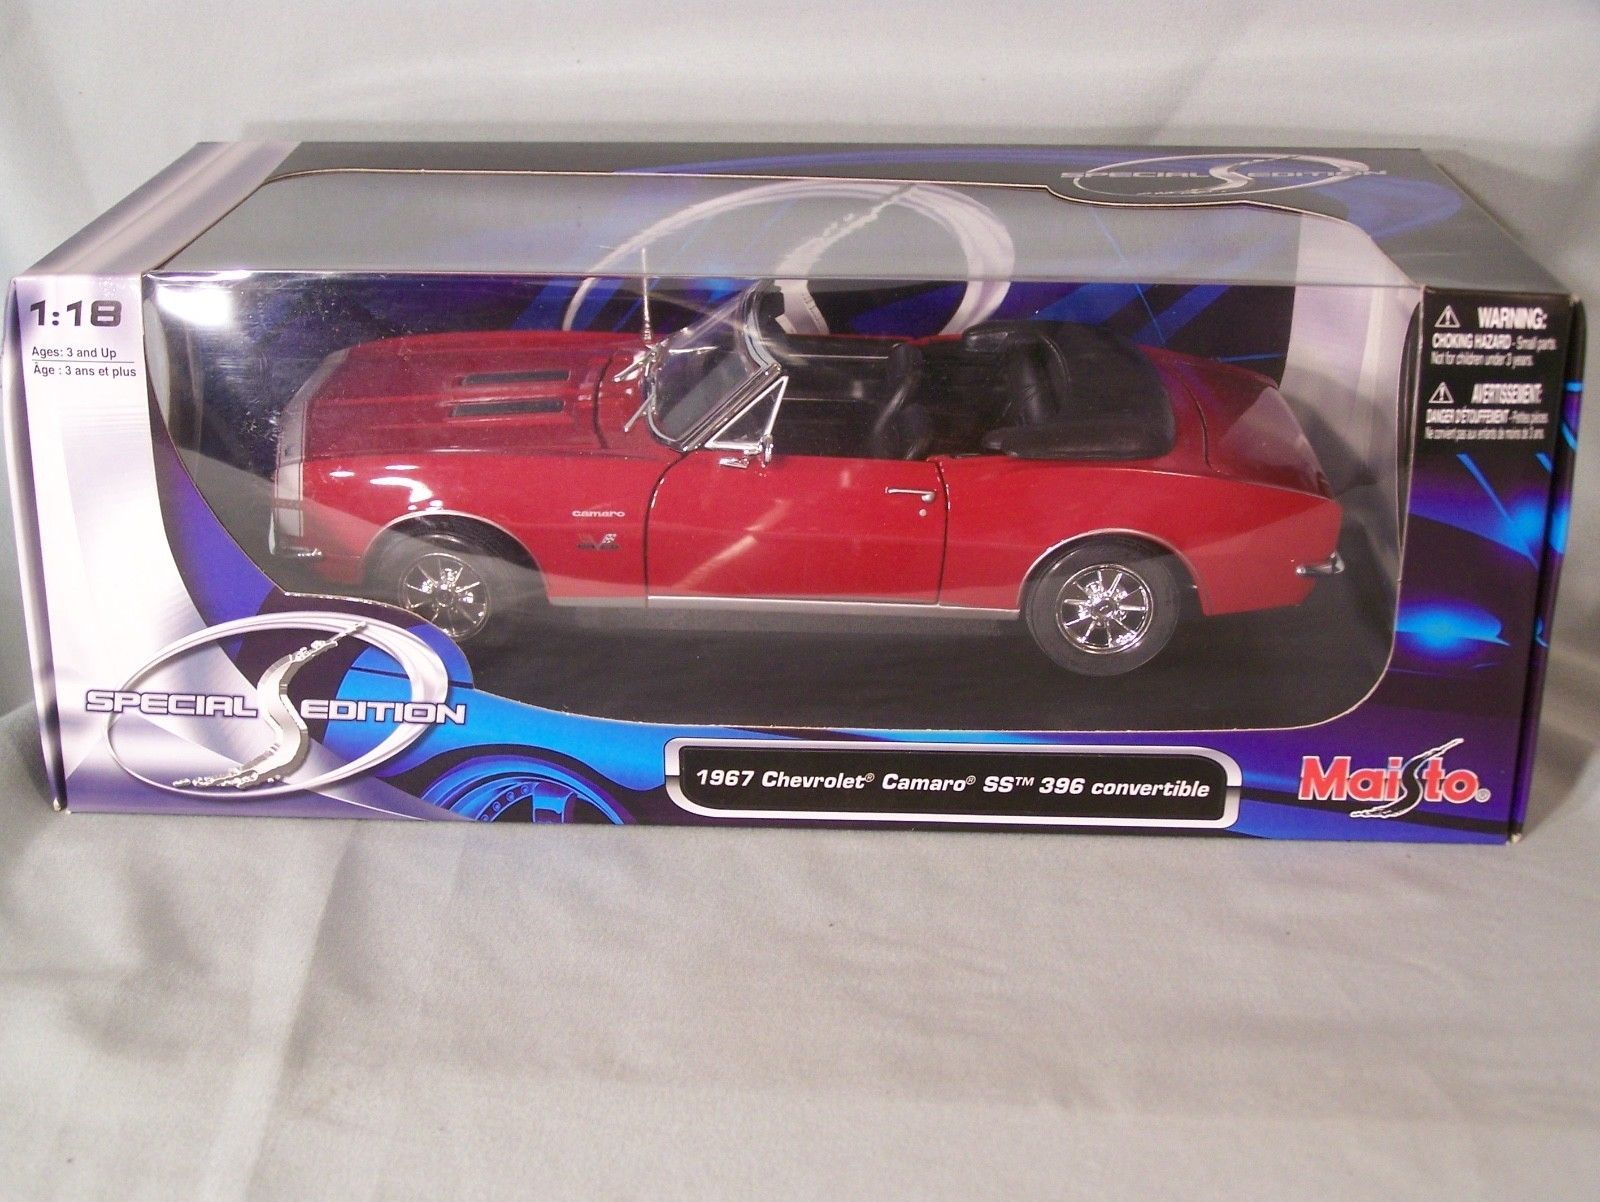 New Maisto 1967 Camaro RS//SS 396 Special Edition Diecast 1//18